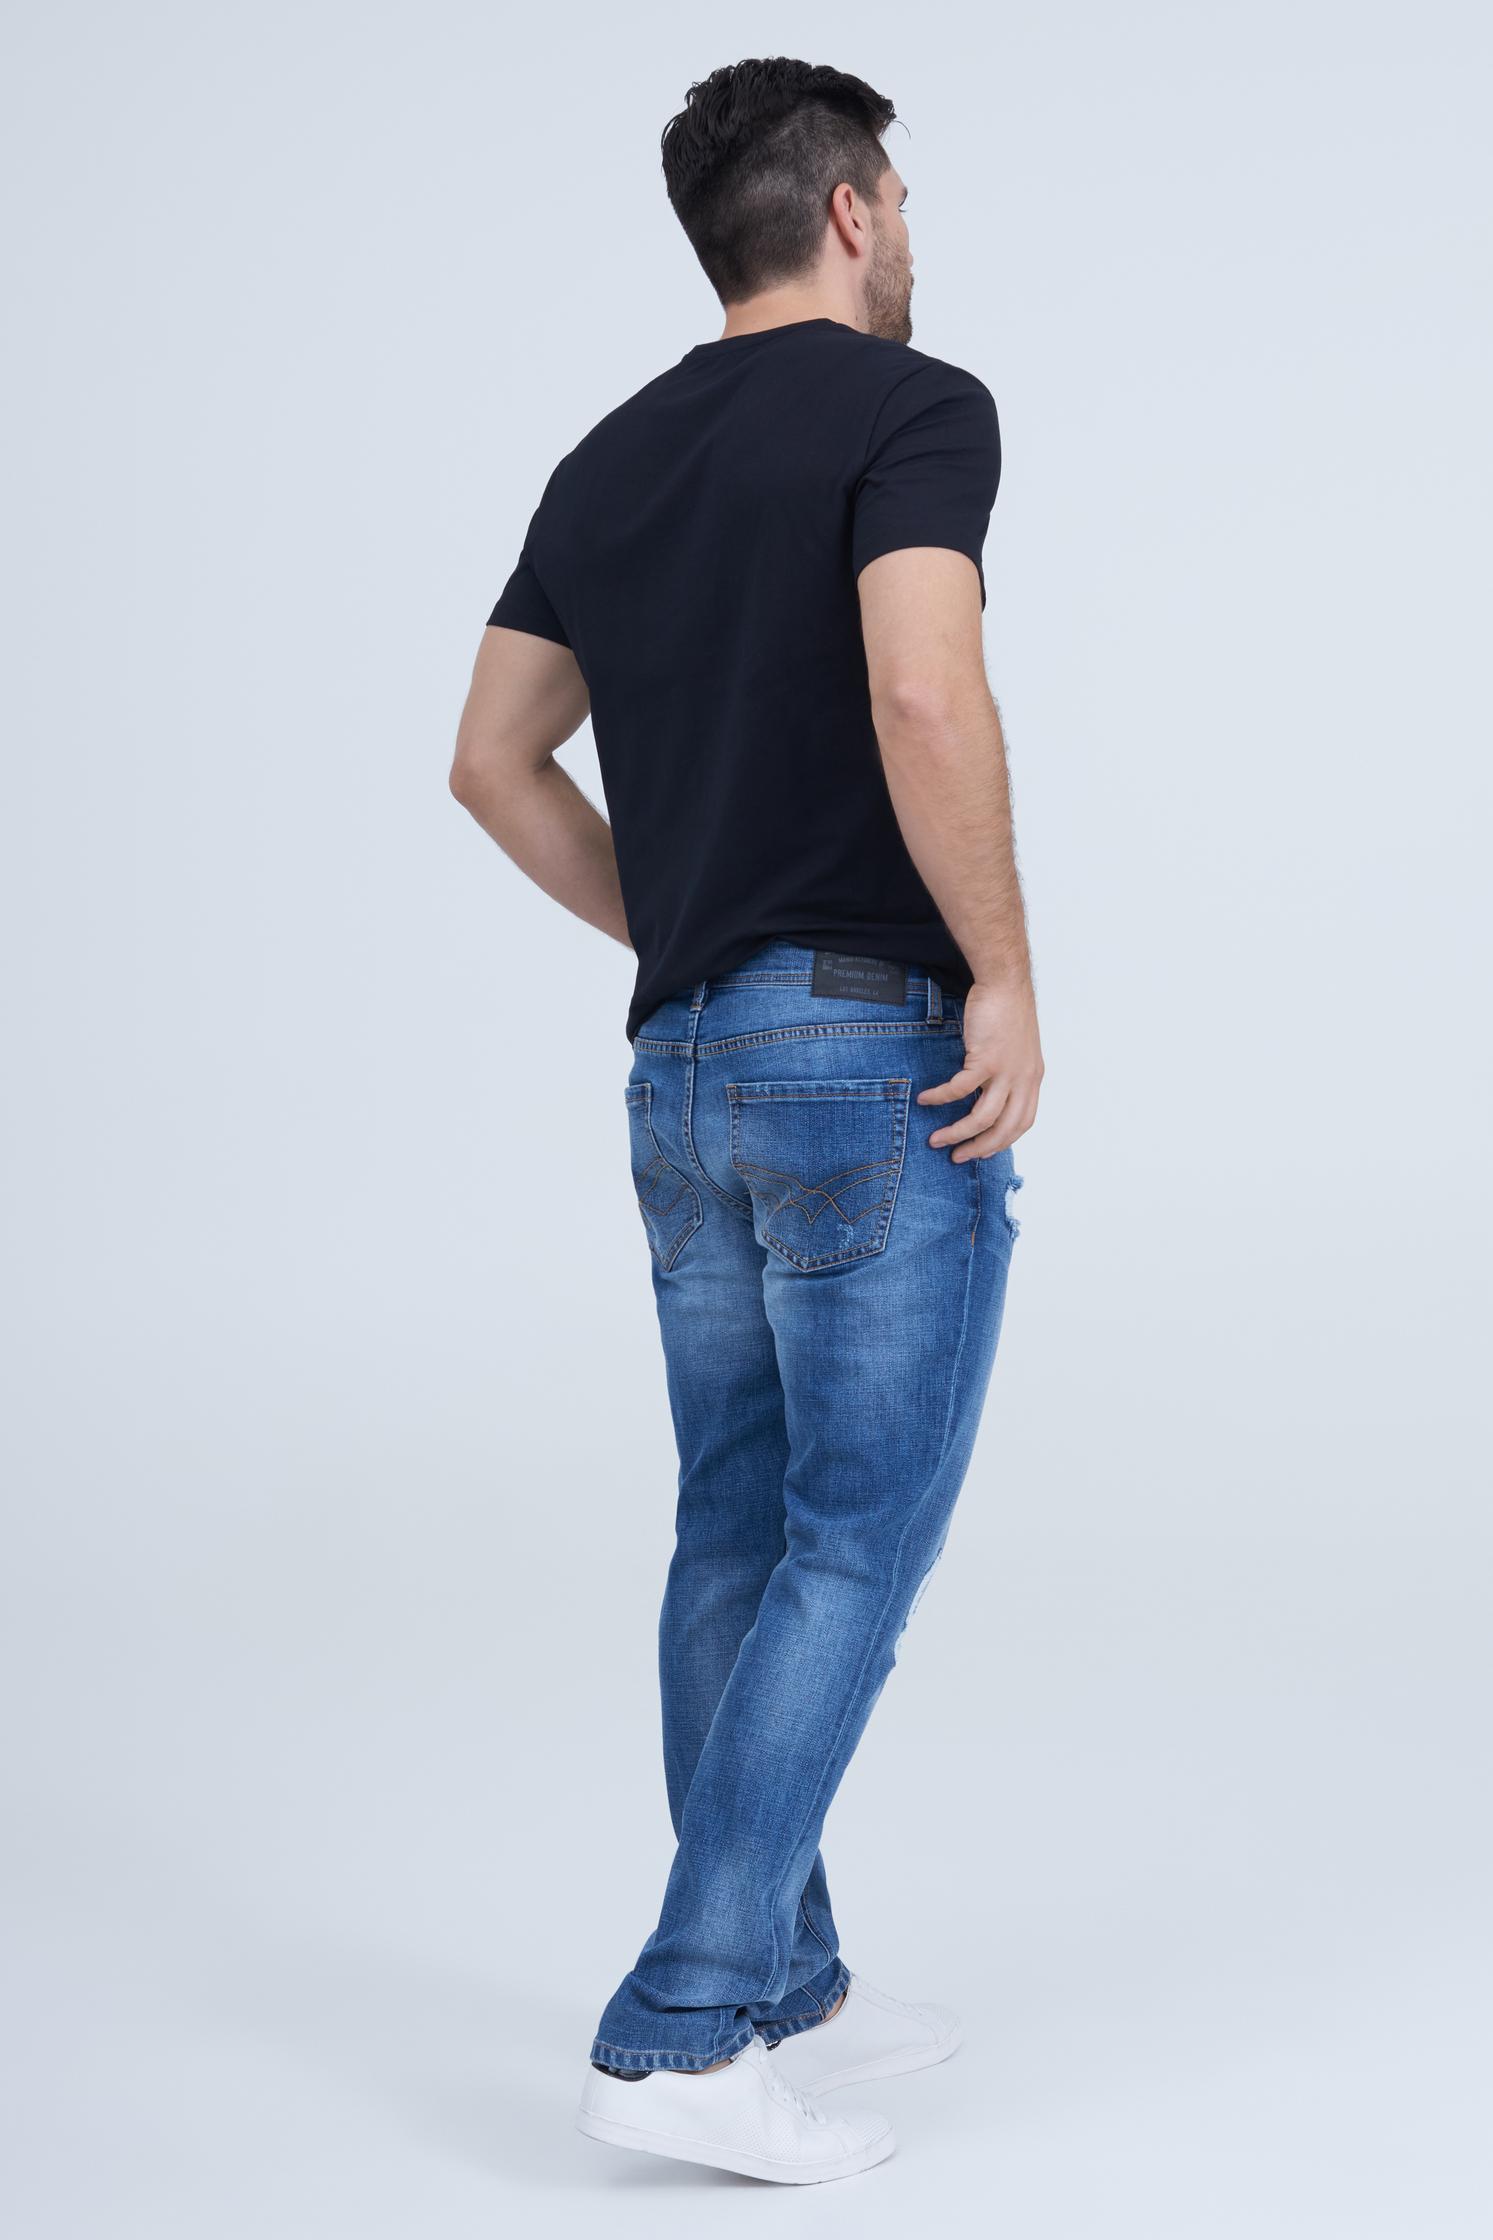 Joes Jeans Mens Classic Straight Leg Jean in Rossdale